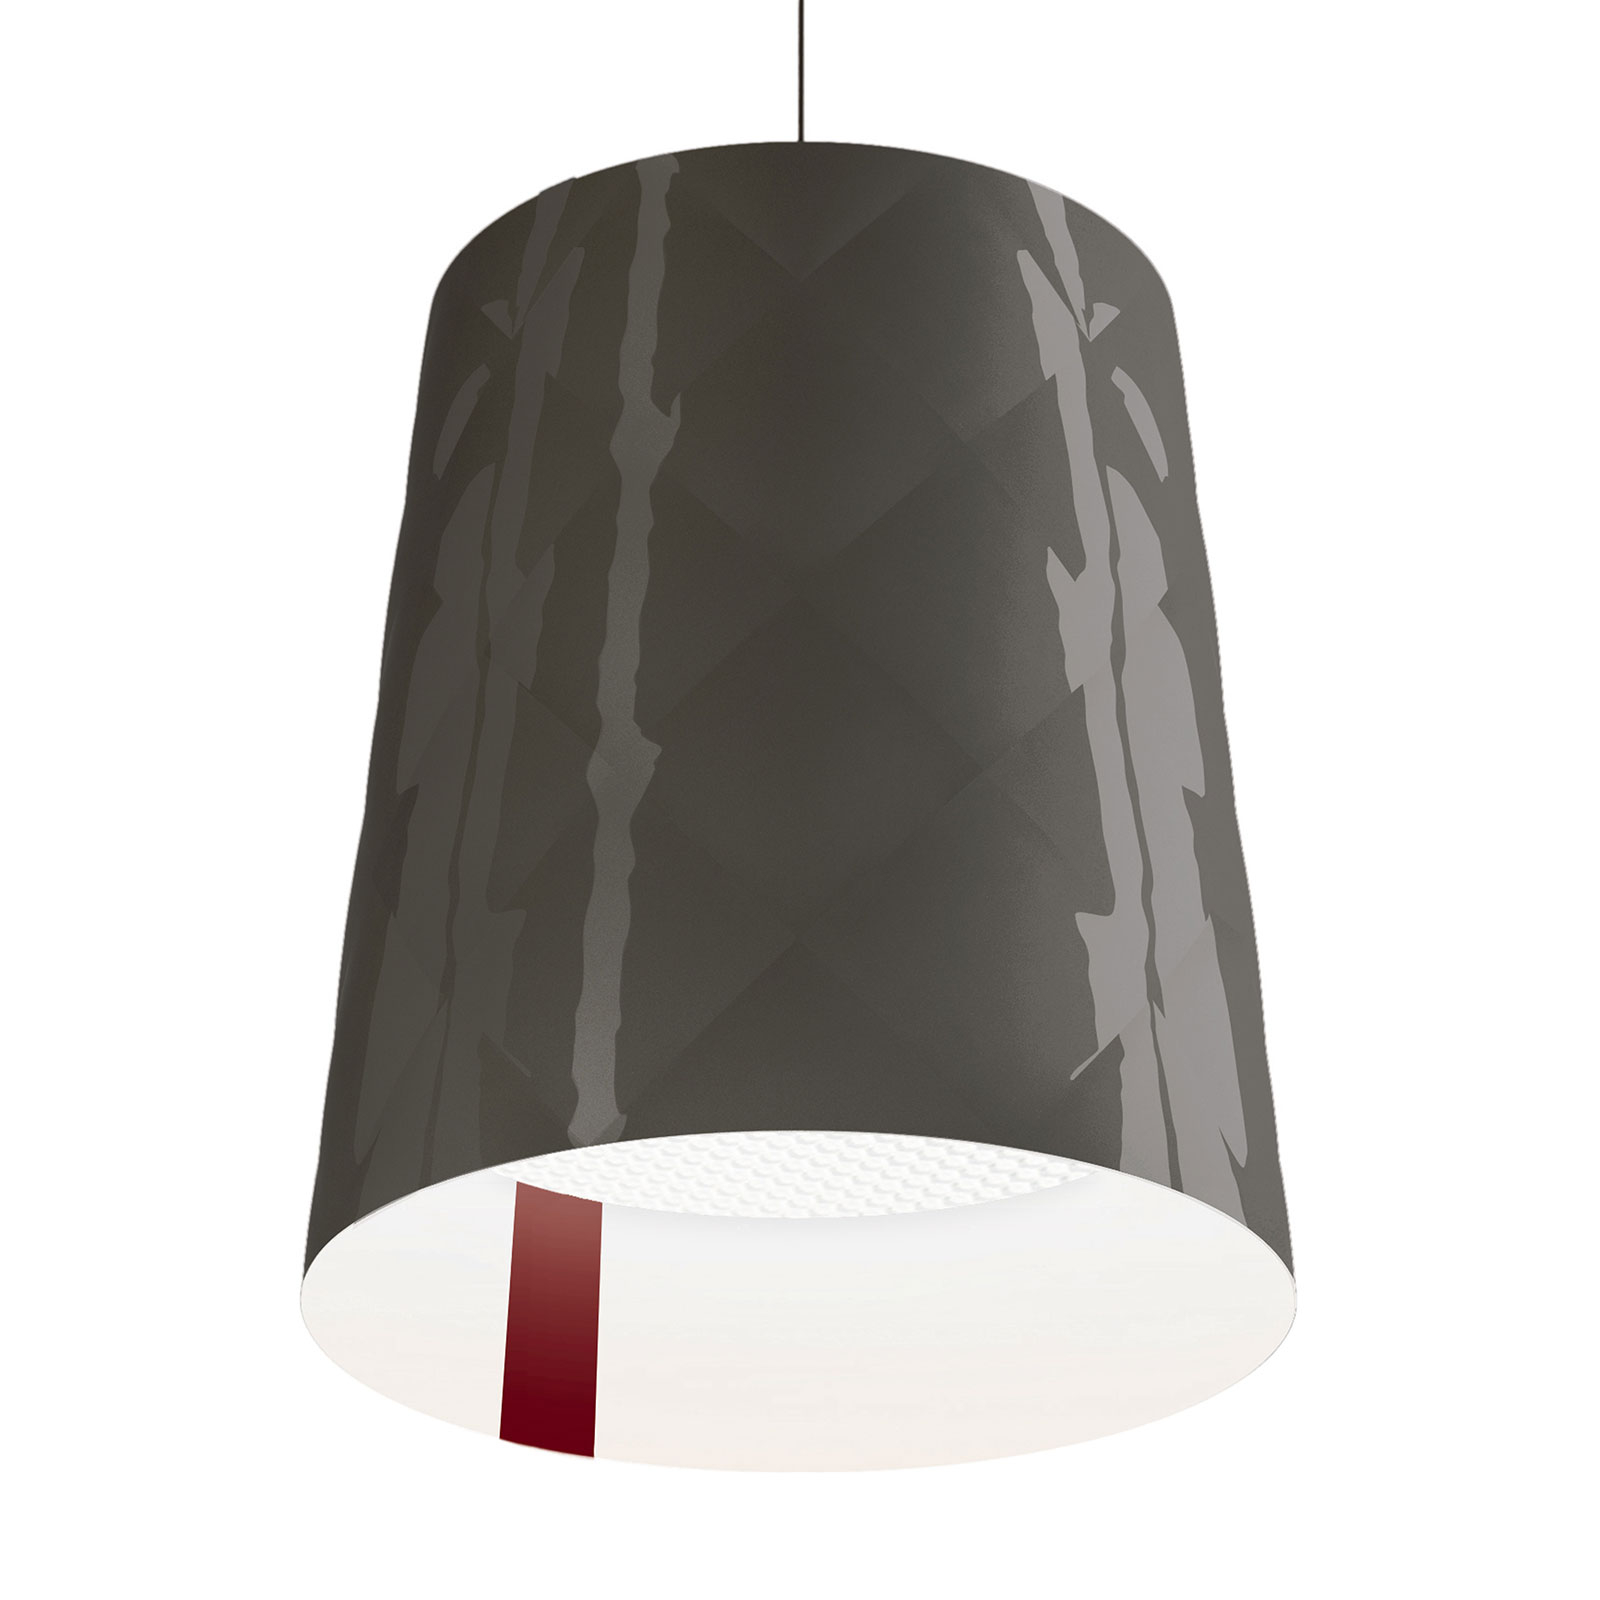 Kundalini New York hanglamp, Ø 45 cm, grijs